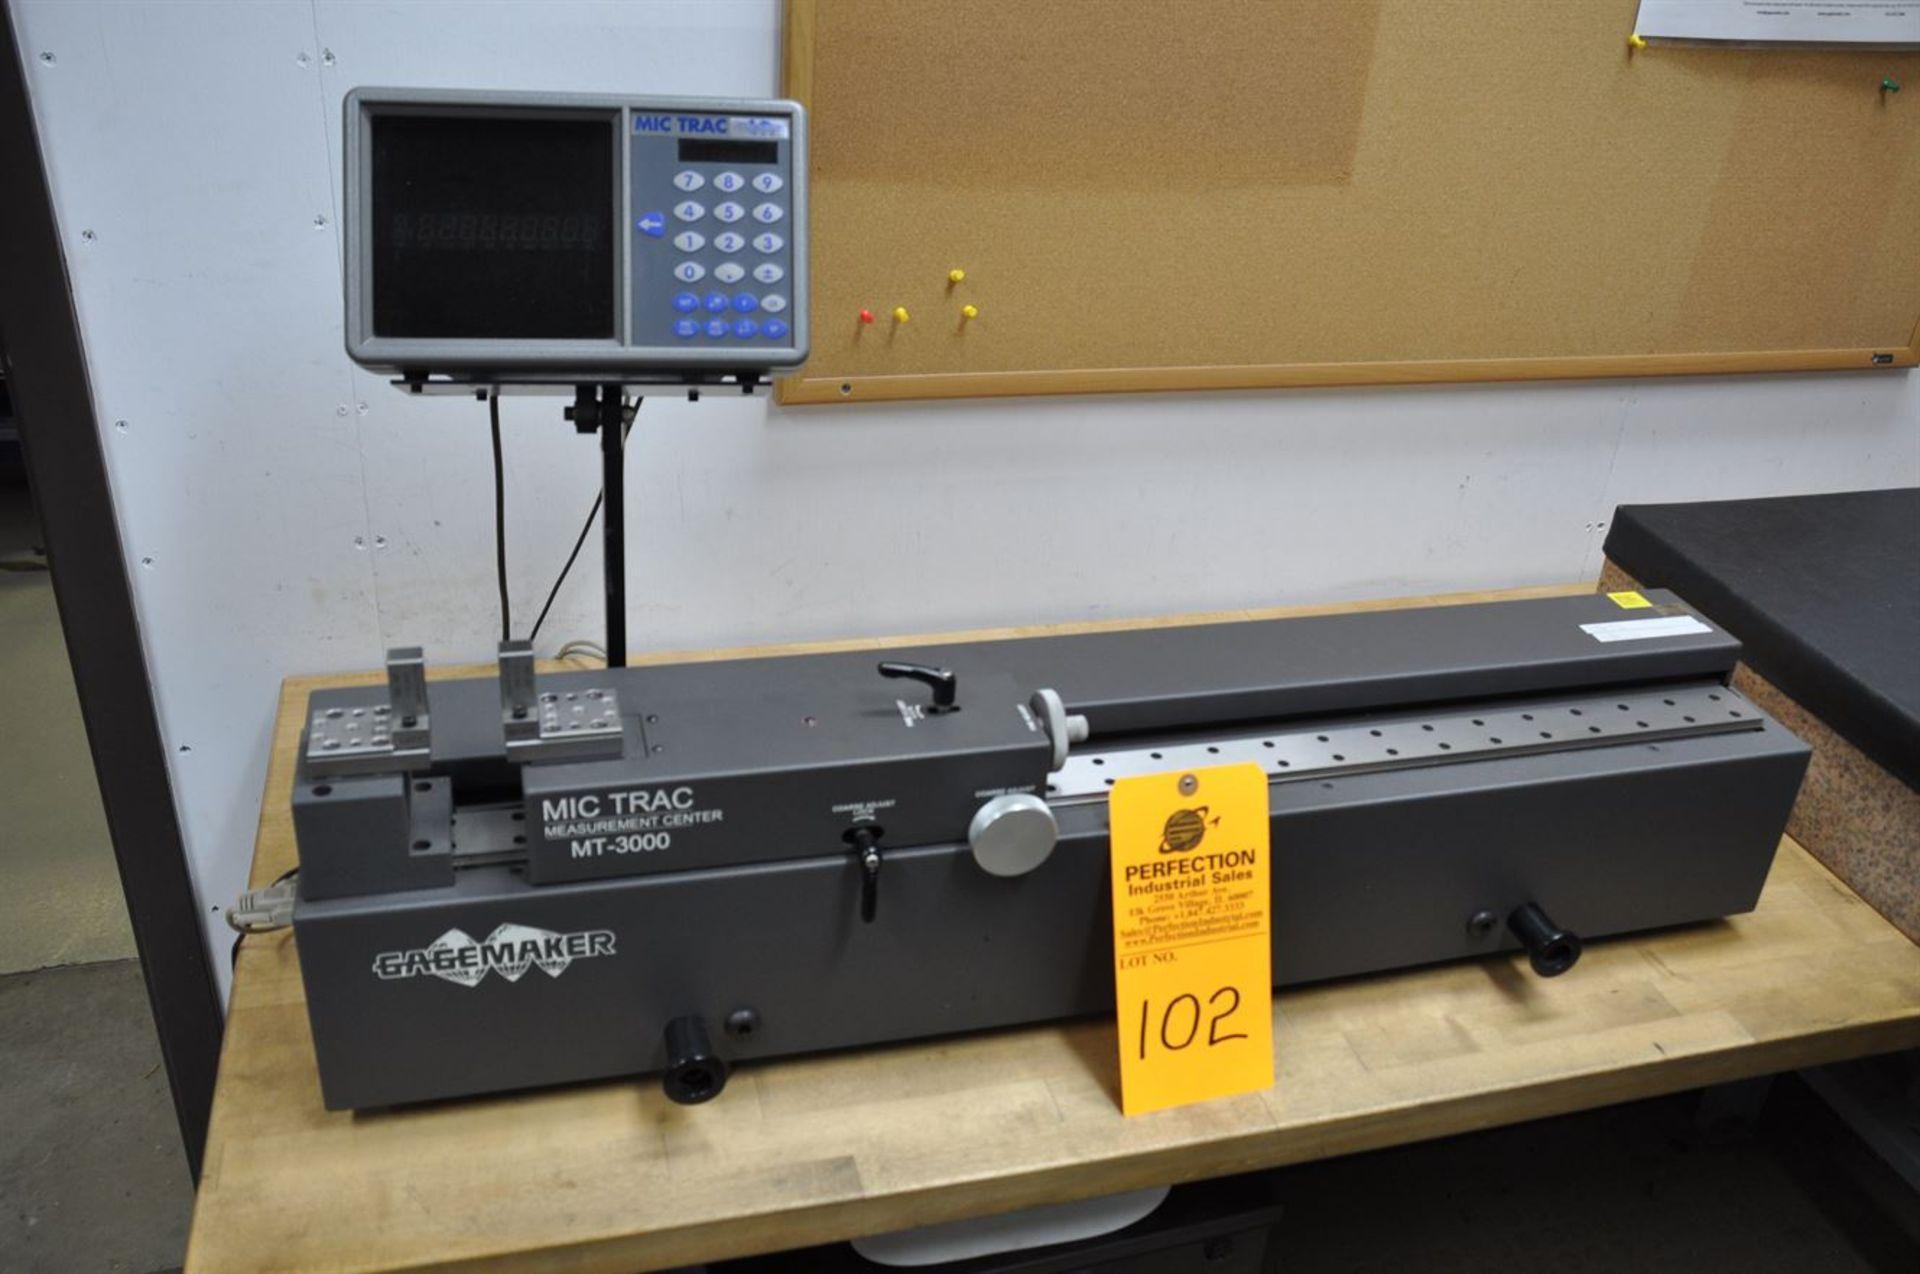 2012 GAGEMAKER MIC TRAC MT 3000 Measurement Center, s/n NA